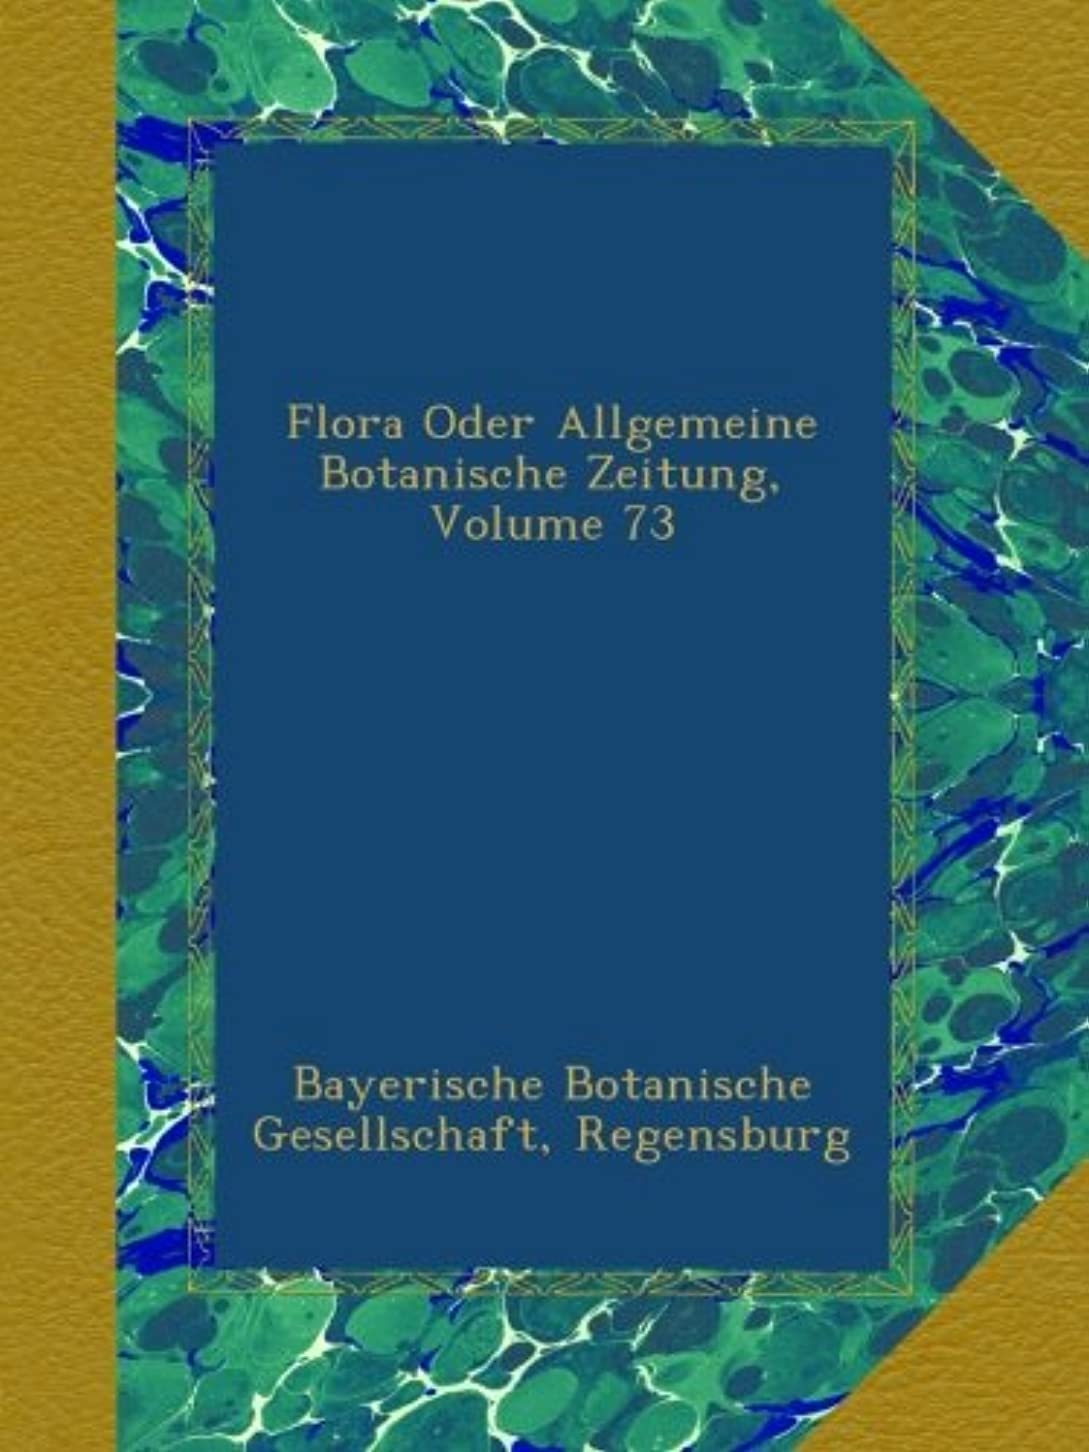 オンス老人研磨剤Flora Oder Allgemeine Botanische Zeitung, Volume 73